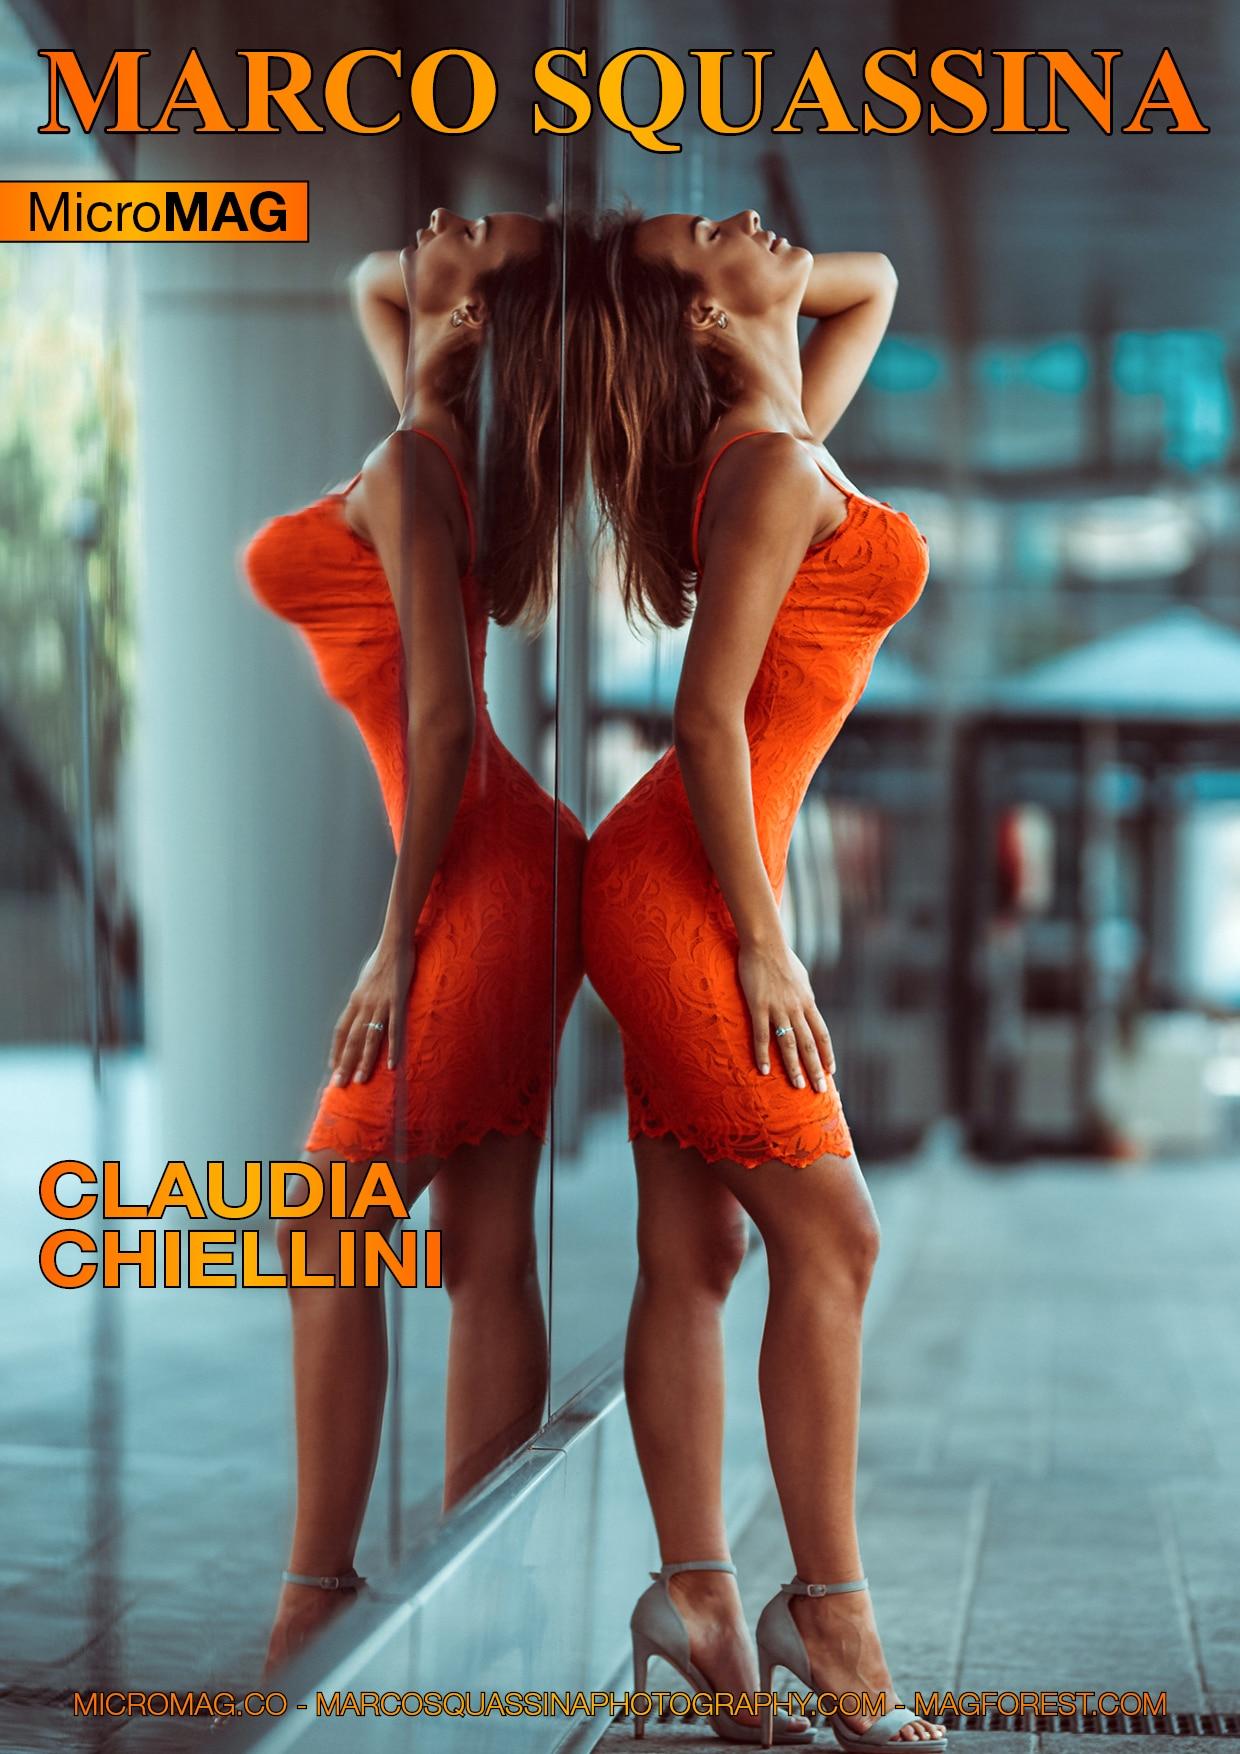 Marco Squassina MicroMAG – Claudia Chiellini